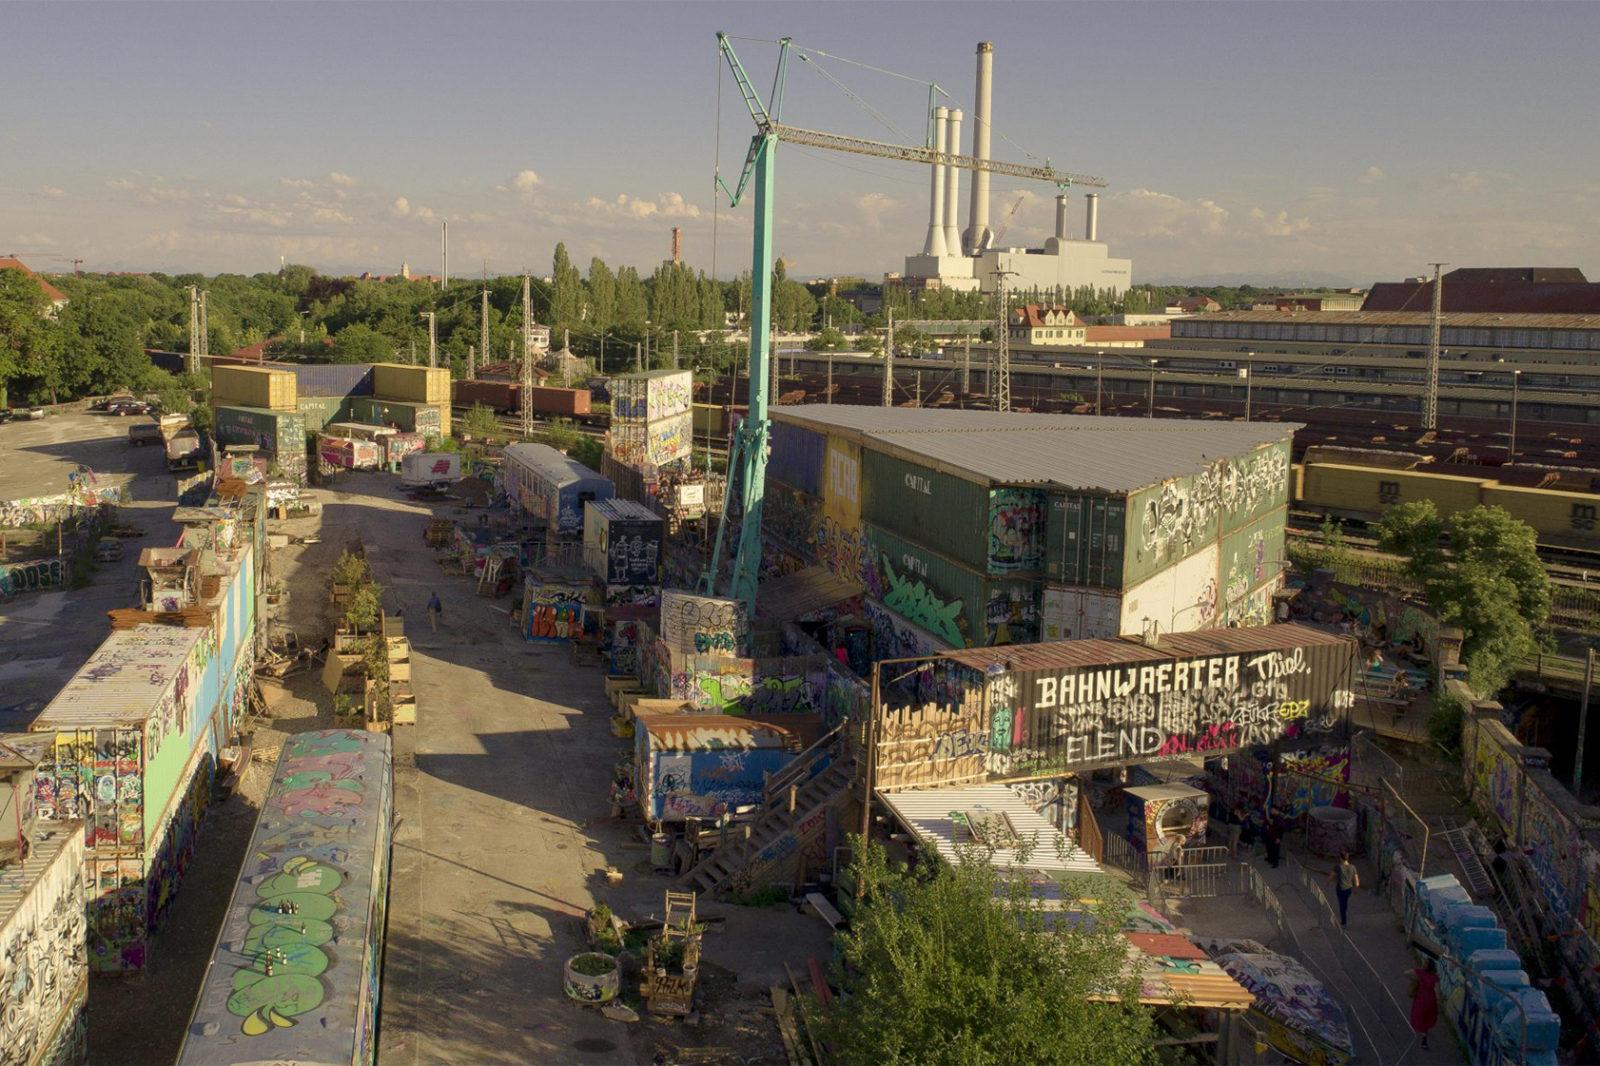 Bahnwärter Thiel, Munich – A popular cultural off-space instigated by Daniel Hahn